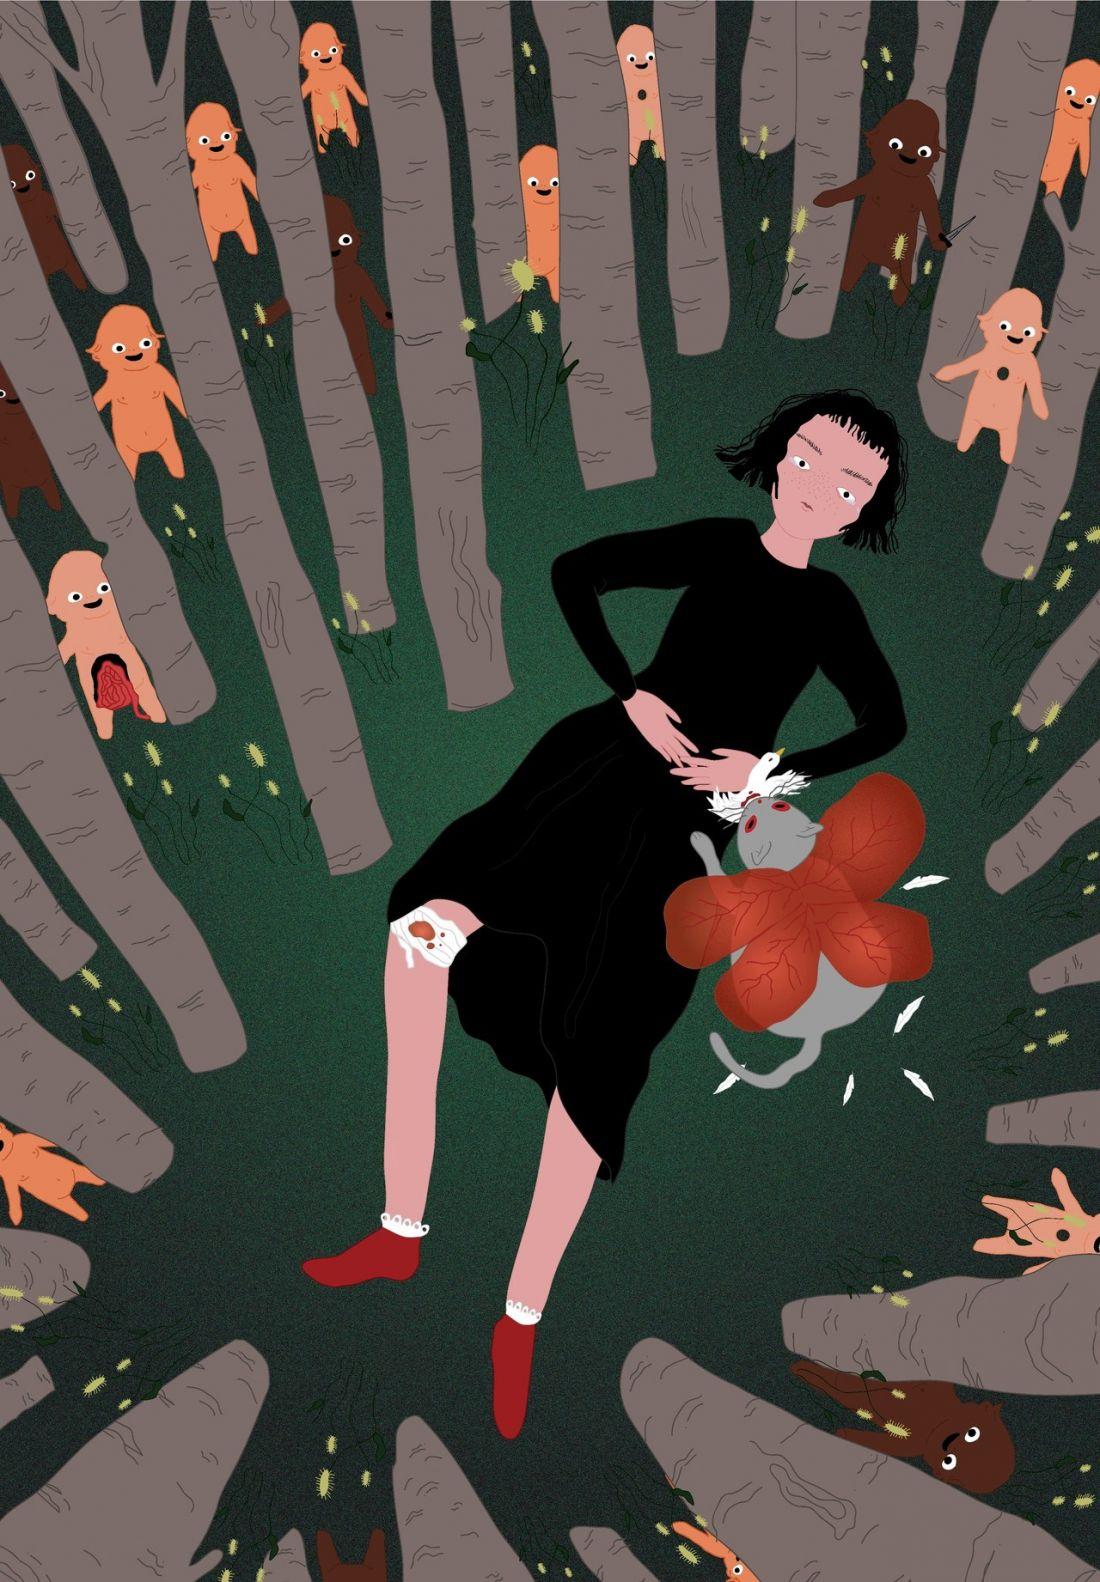 Anna Karenina's eerie, Lynch-obsessed portrayals of girlhood